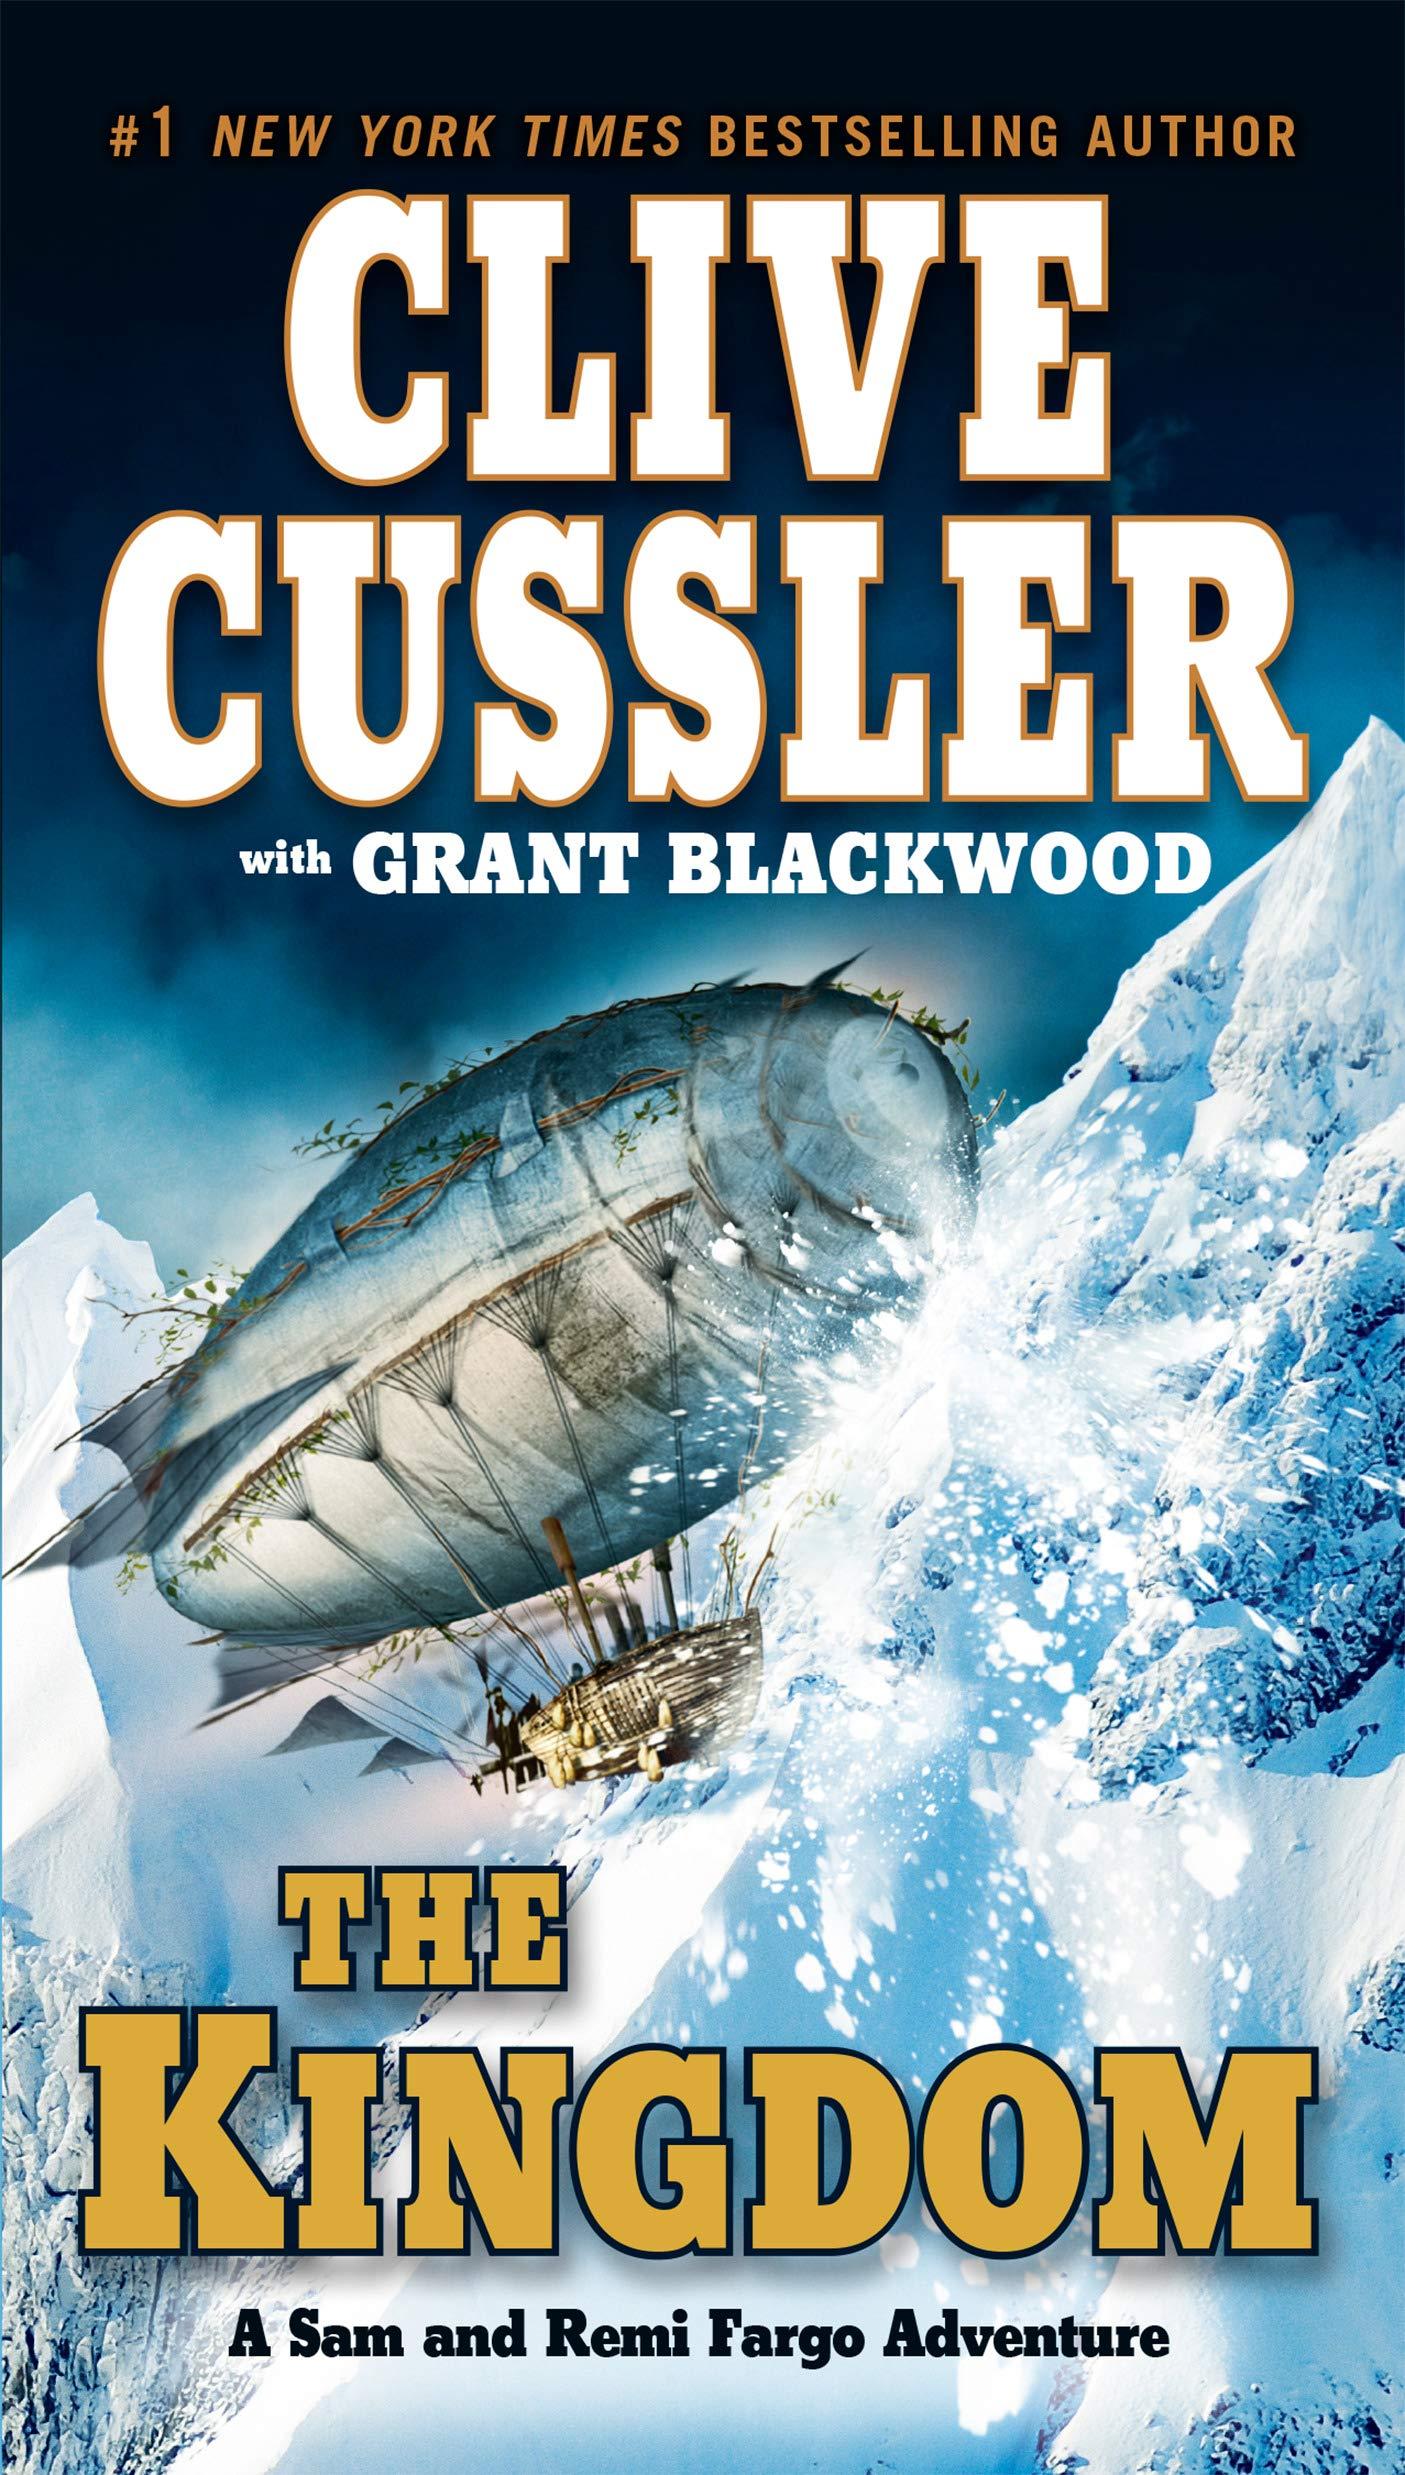 Amazon.com: The Kingdom (A Sam and Remi Fargo Adventure) (9780425248089):  Clive Cussler, Grant Blackwood: Books